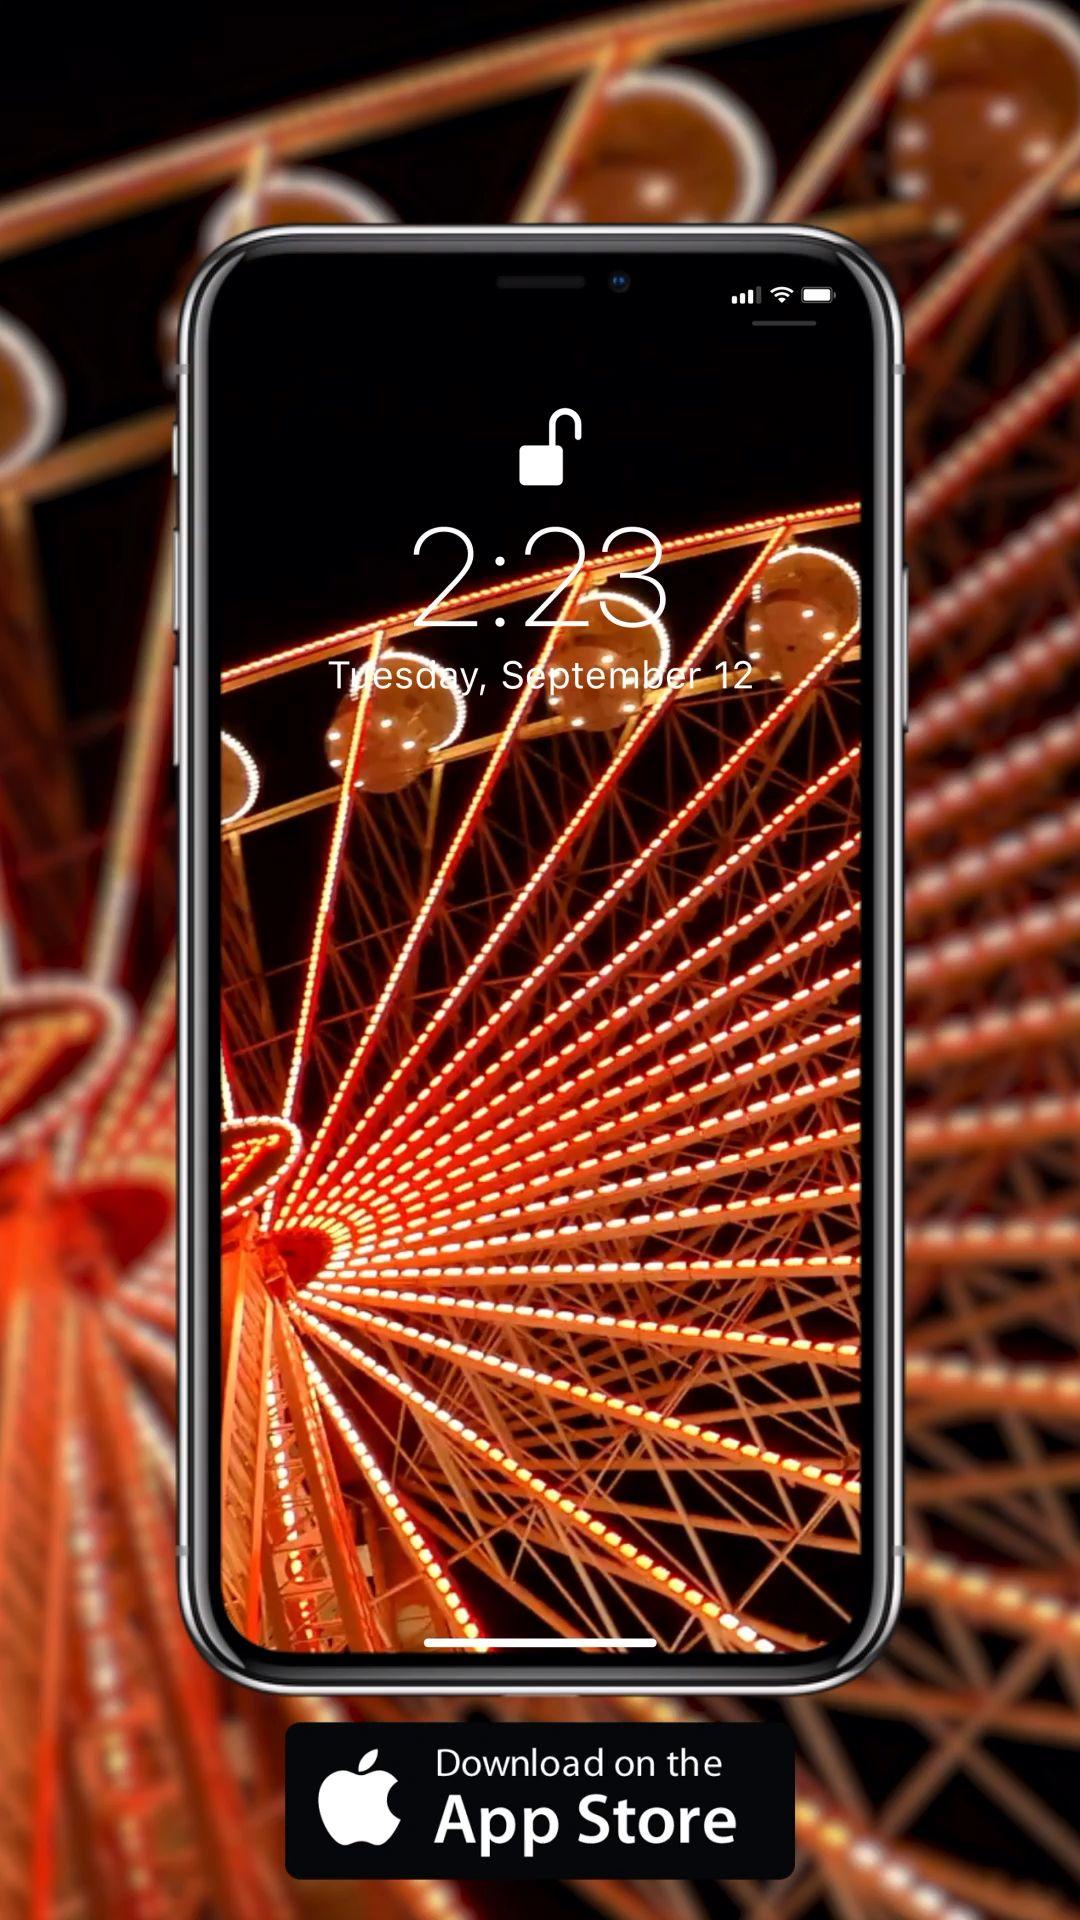 Ferris Wheel Video Iphone Wallpaper Video Live Wallpapers Live Wallpaper Iphone